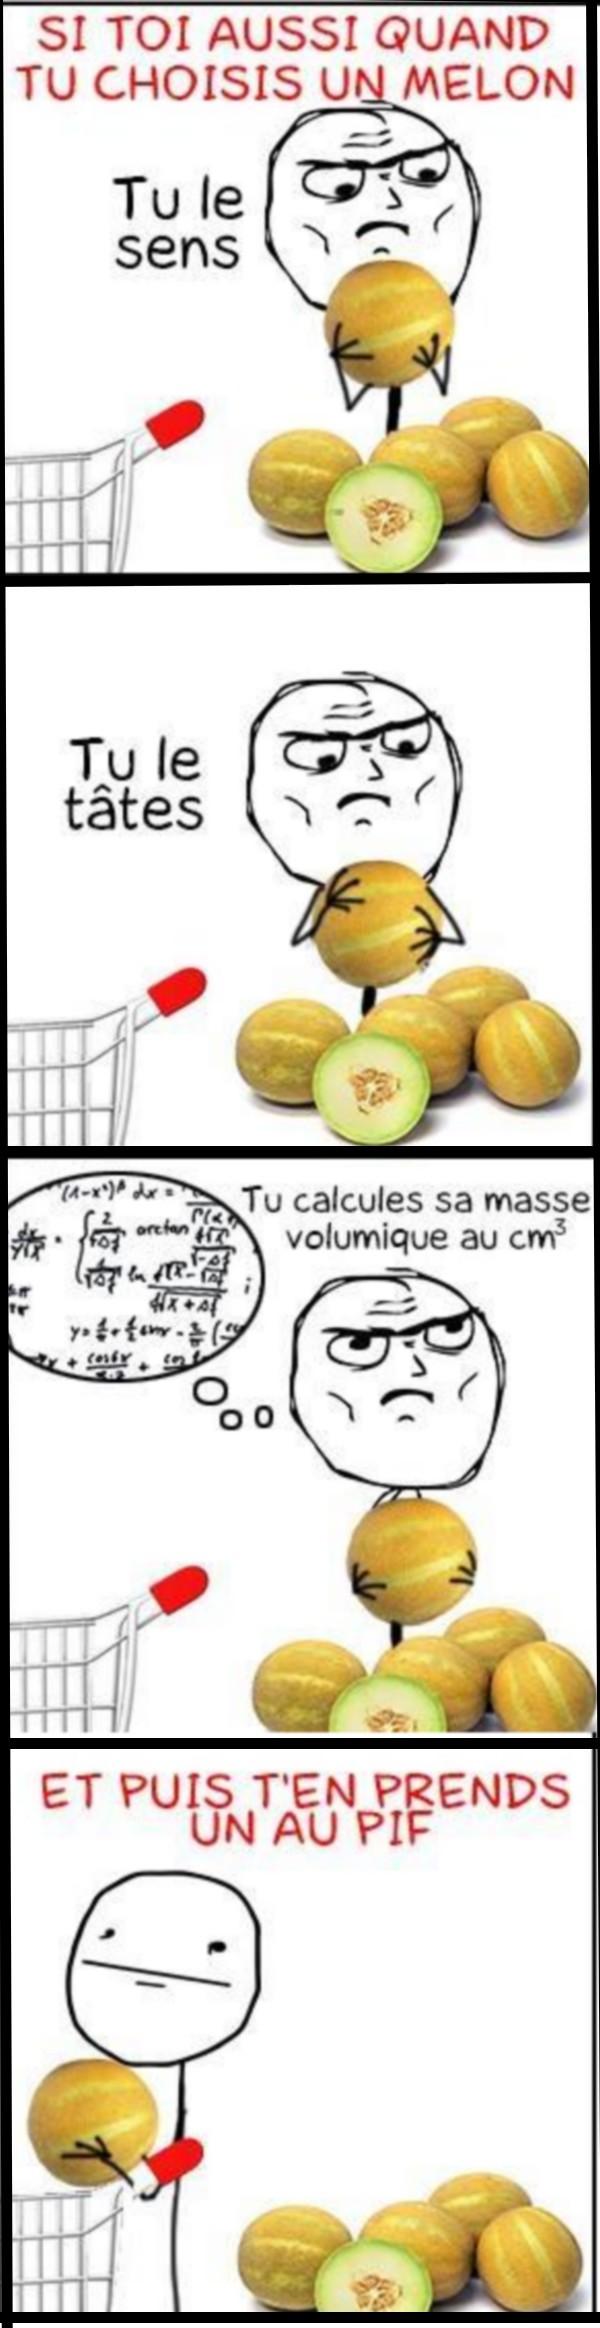 Si toi aussi quand tu choisis un melon tu fais a - Quand cueillir un melon ...